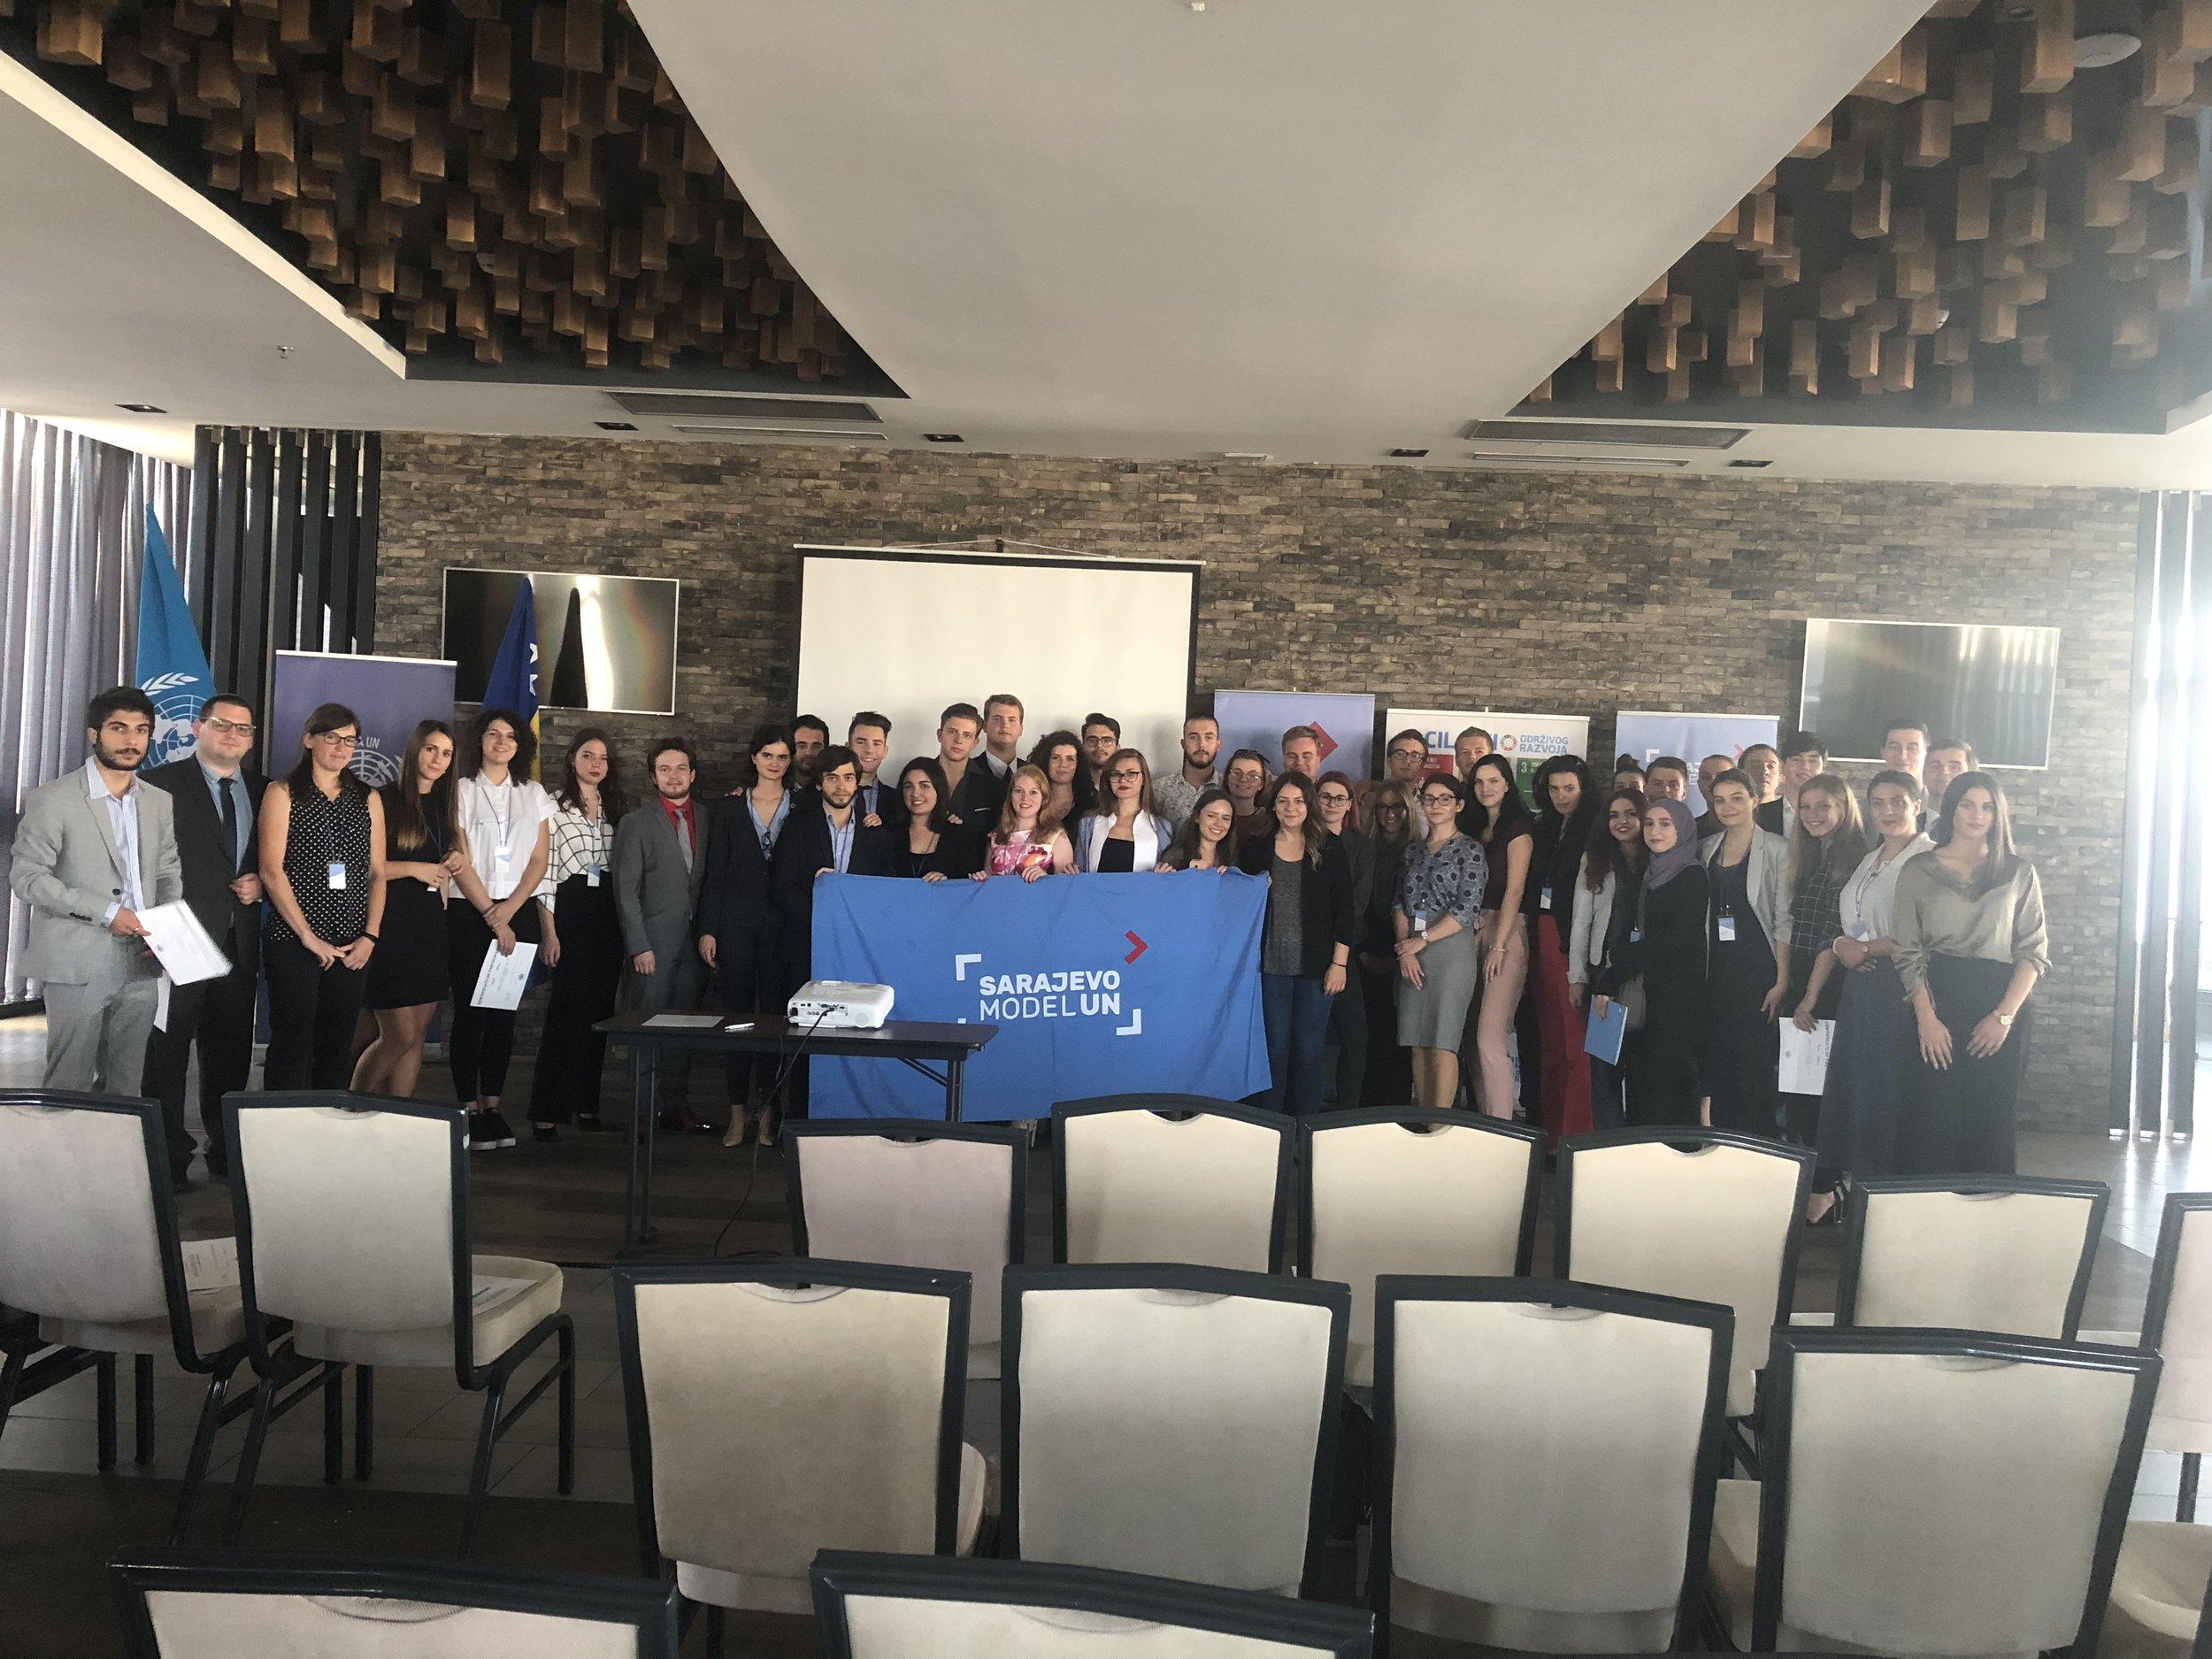 Sarajevo Model UN '18 - Closing Ceremony